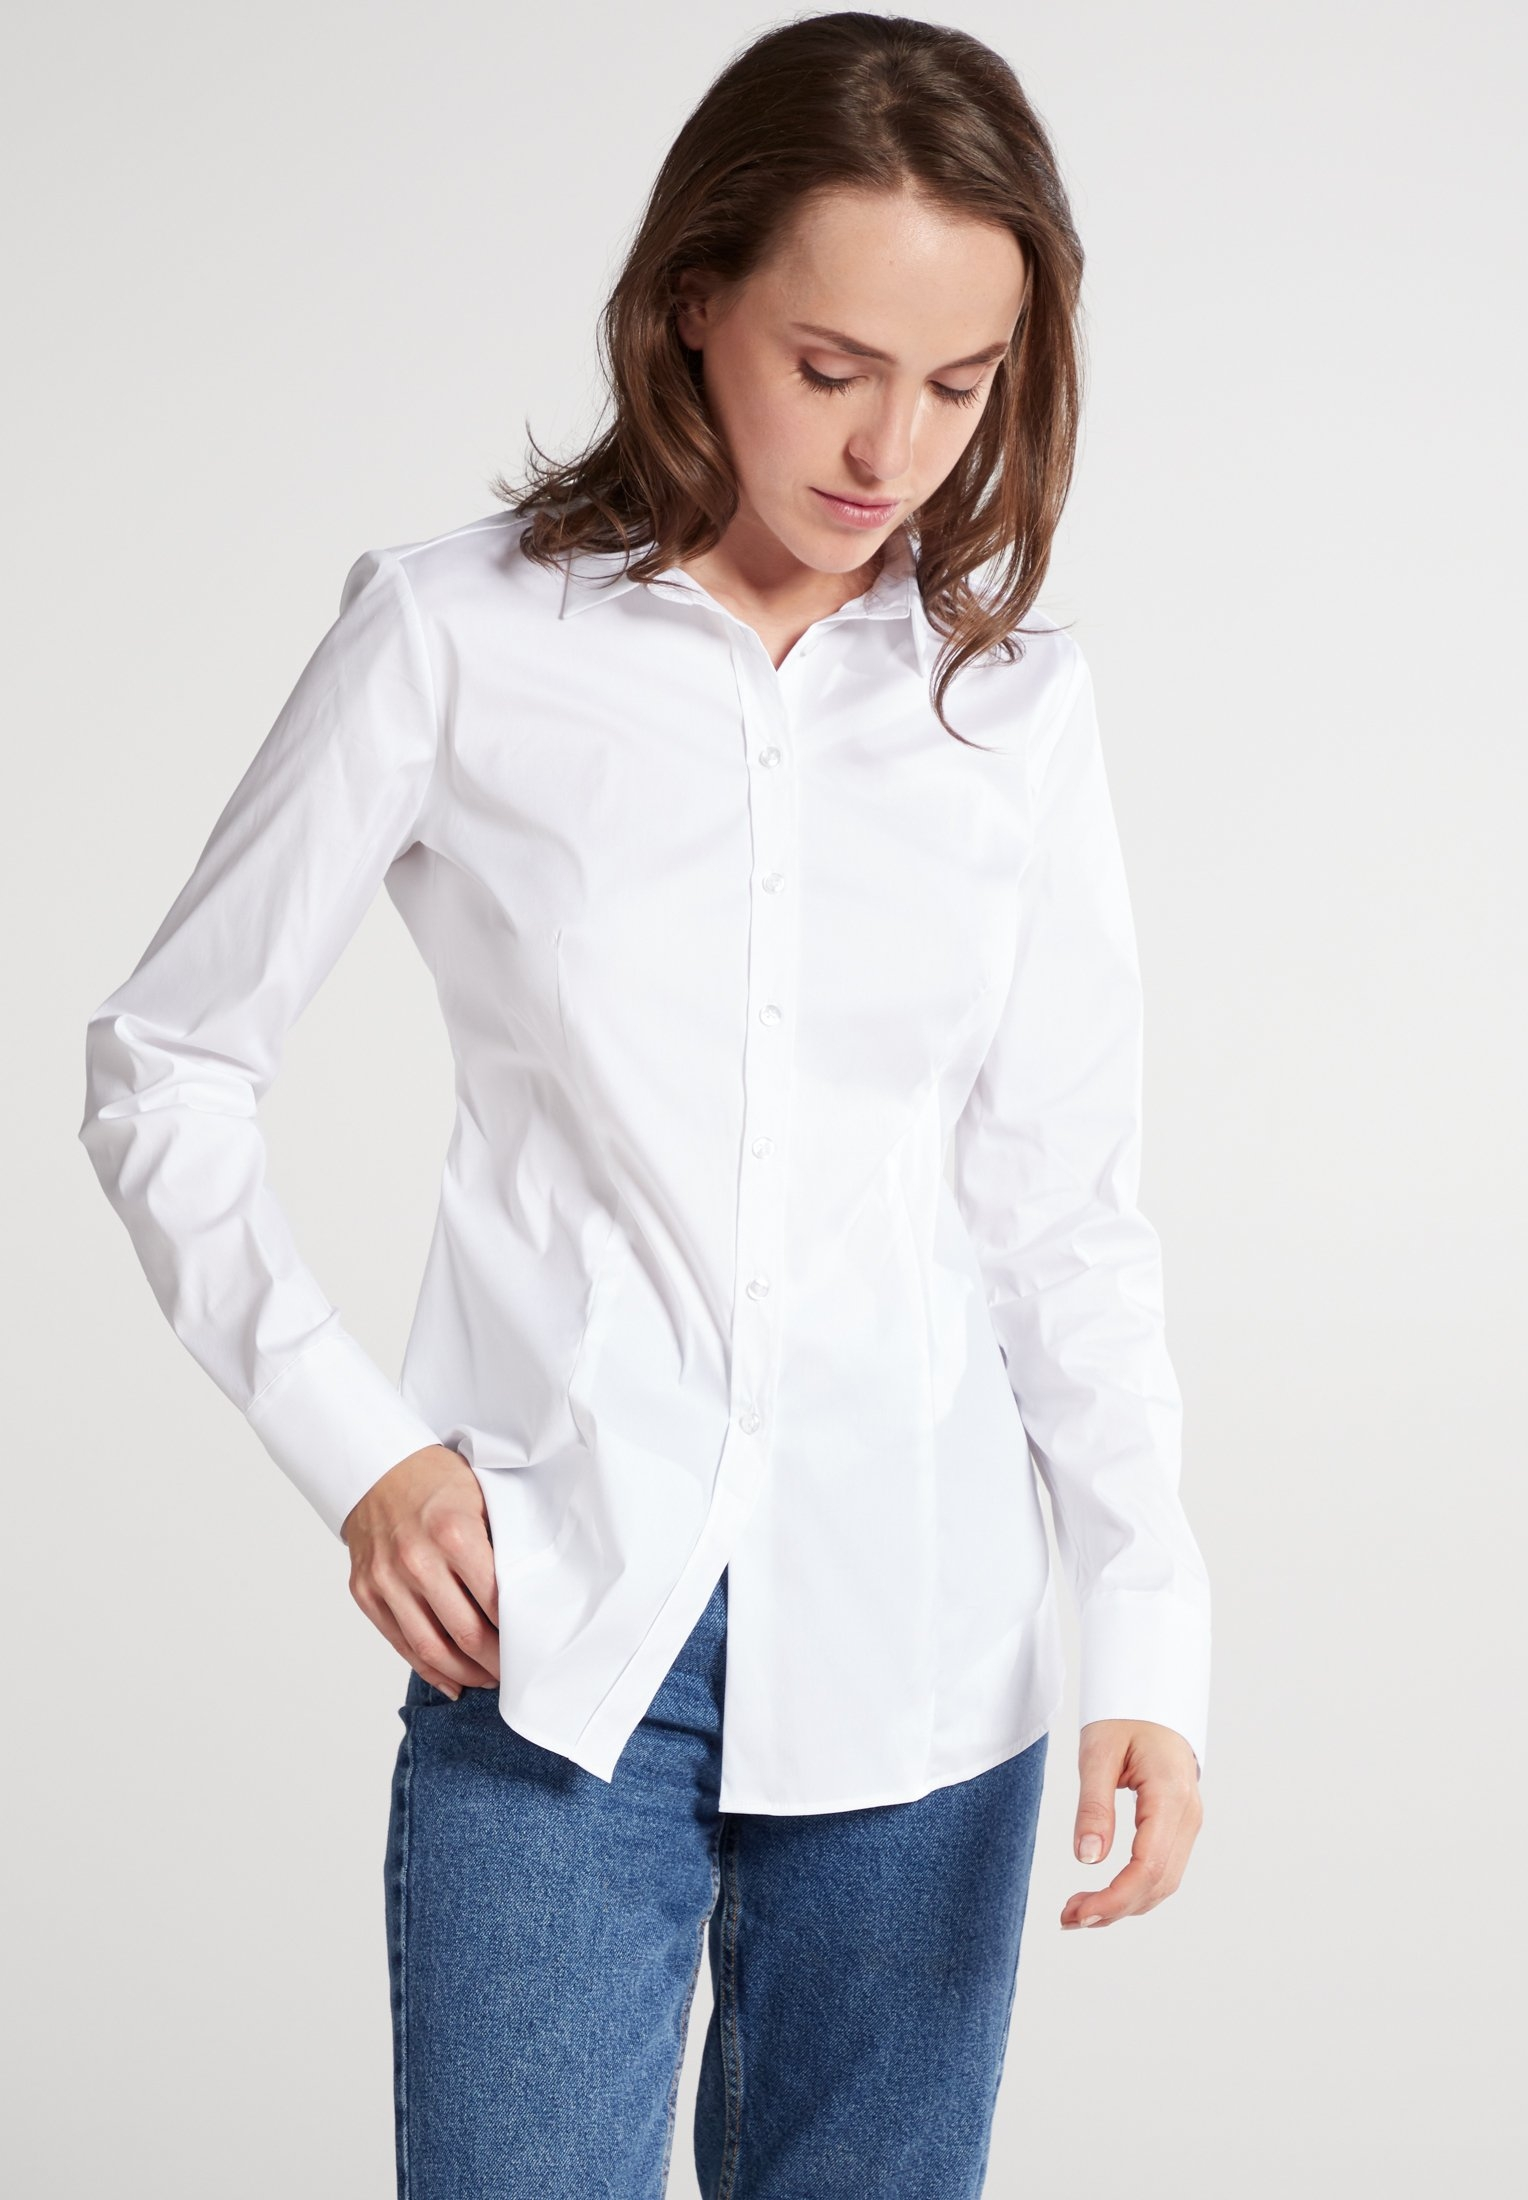 Eterna blouse met lange mouwen MODERN CLASSIC Lange mouwen blouse in de webshop van OTTO kopen